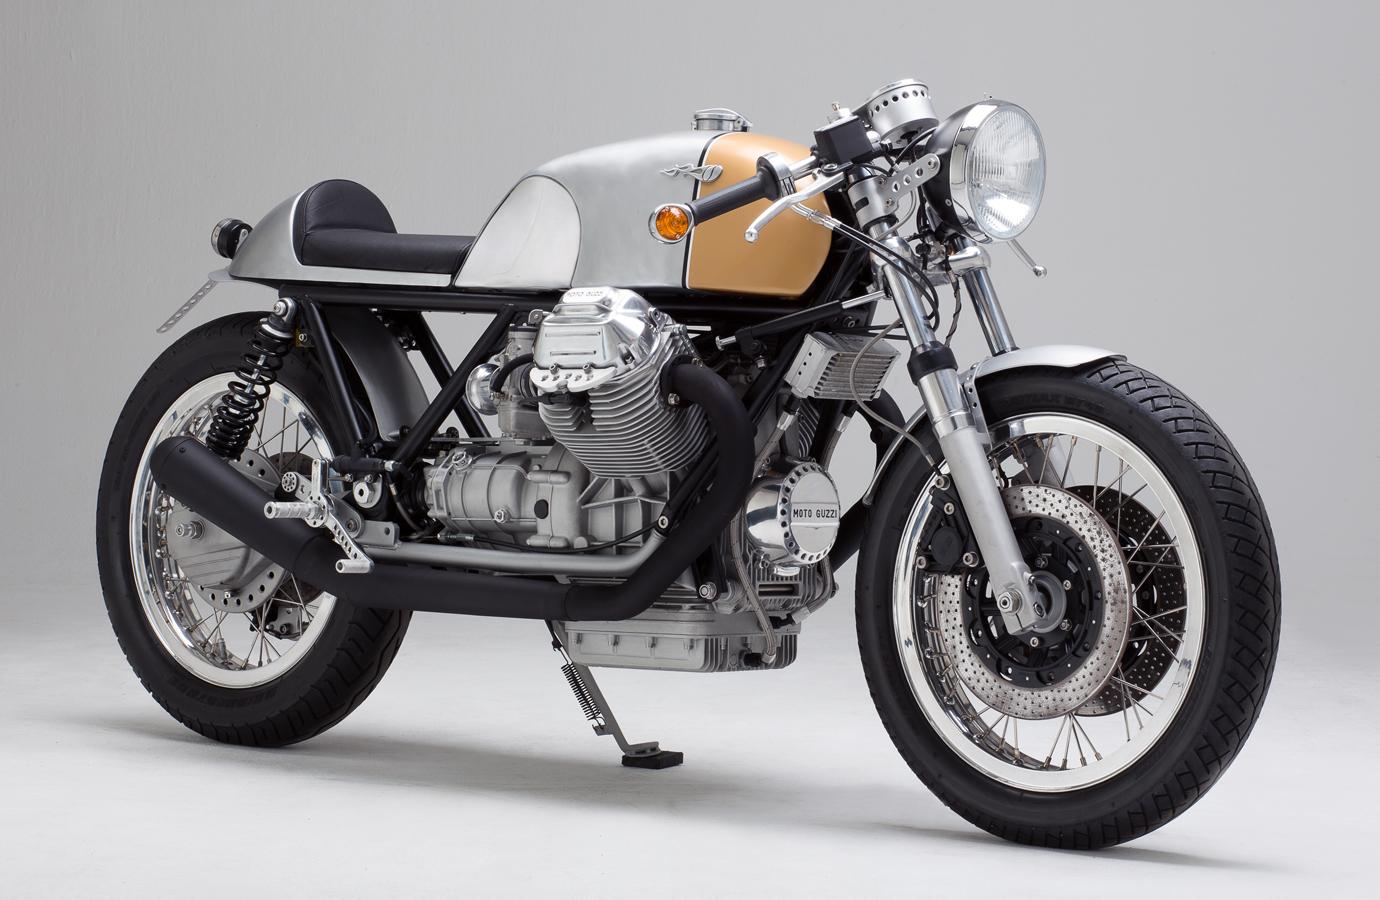 Moto Guzzi Parts Germany